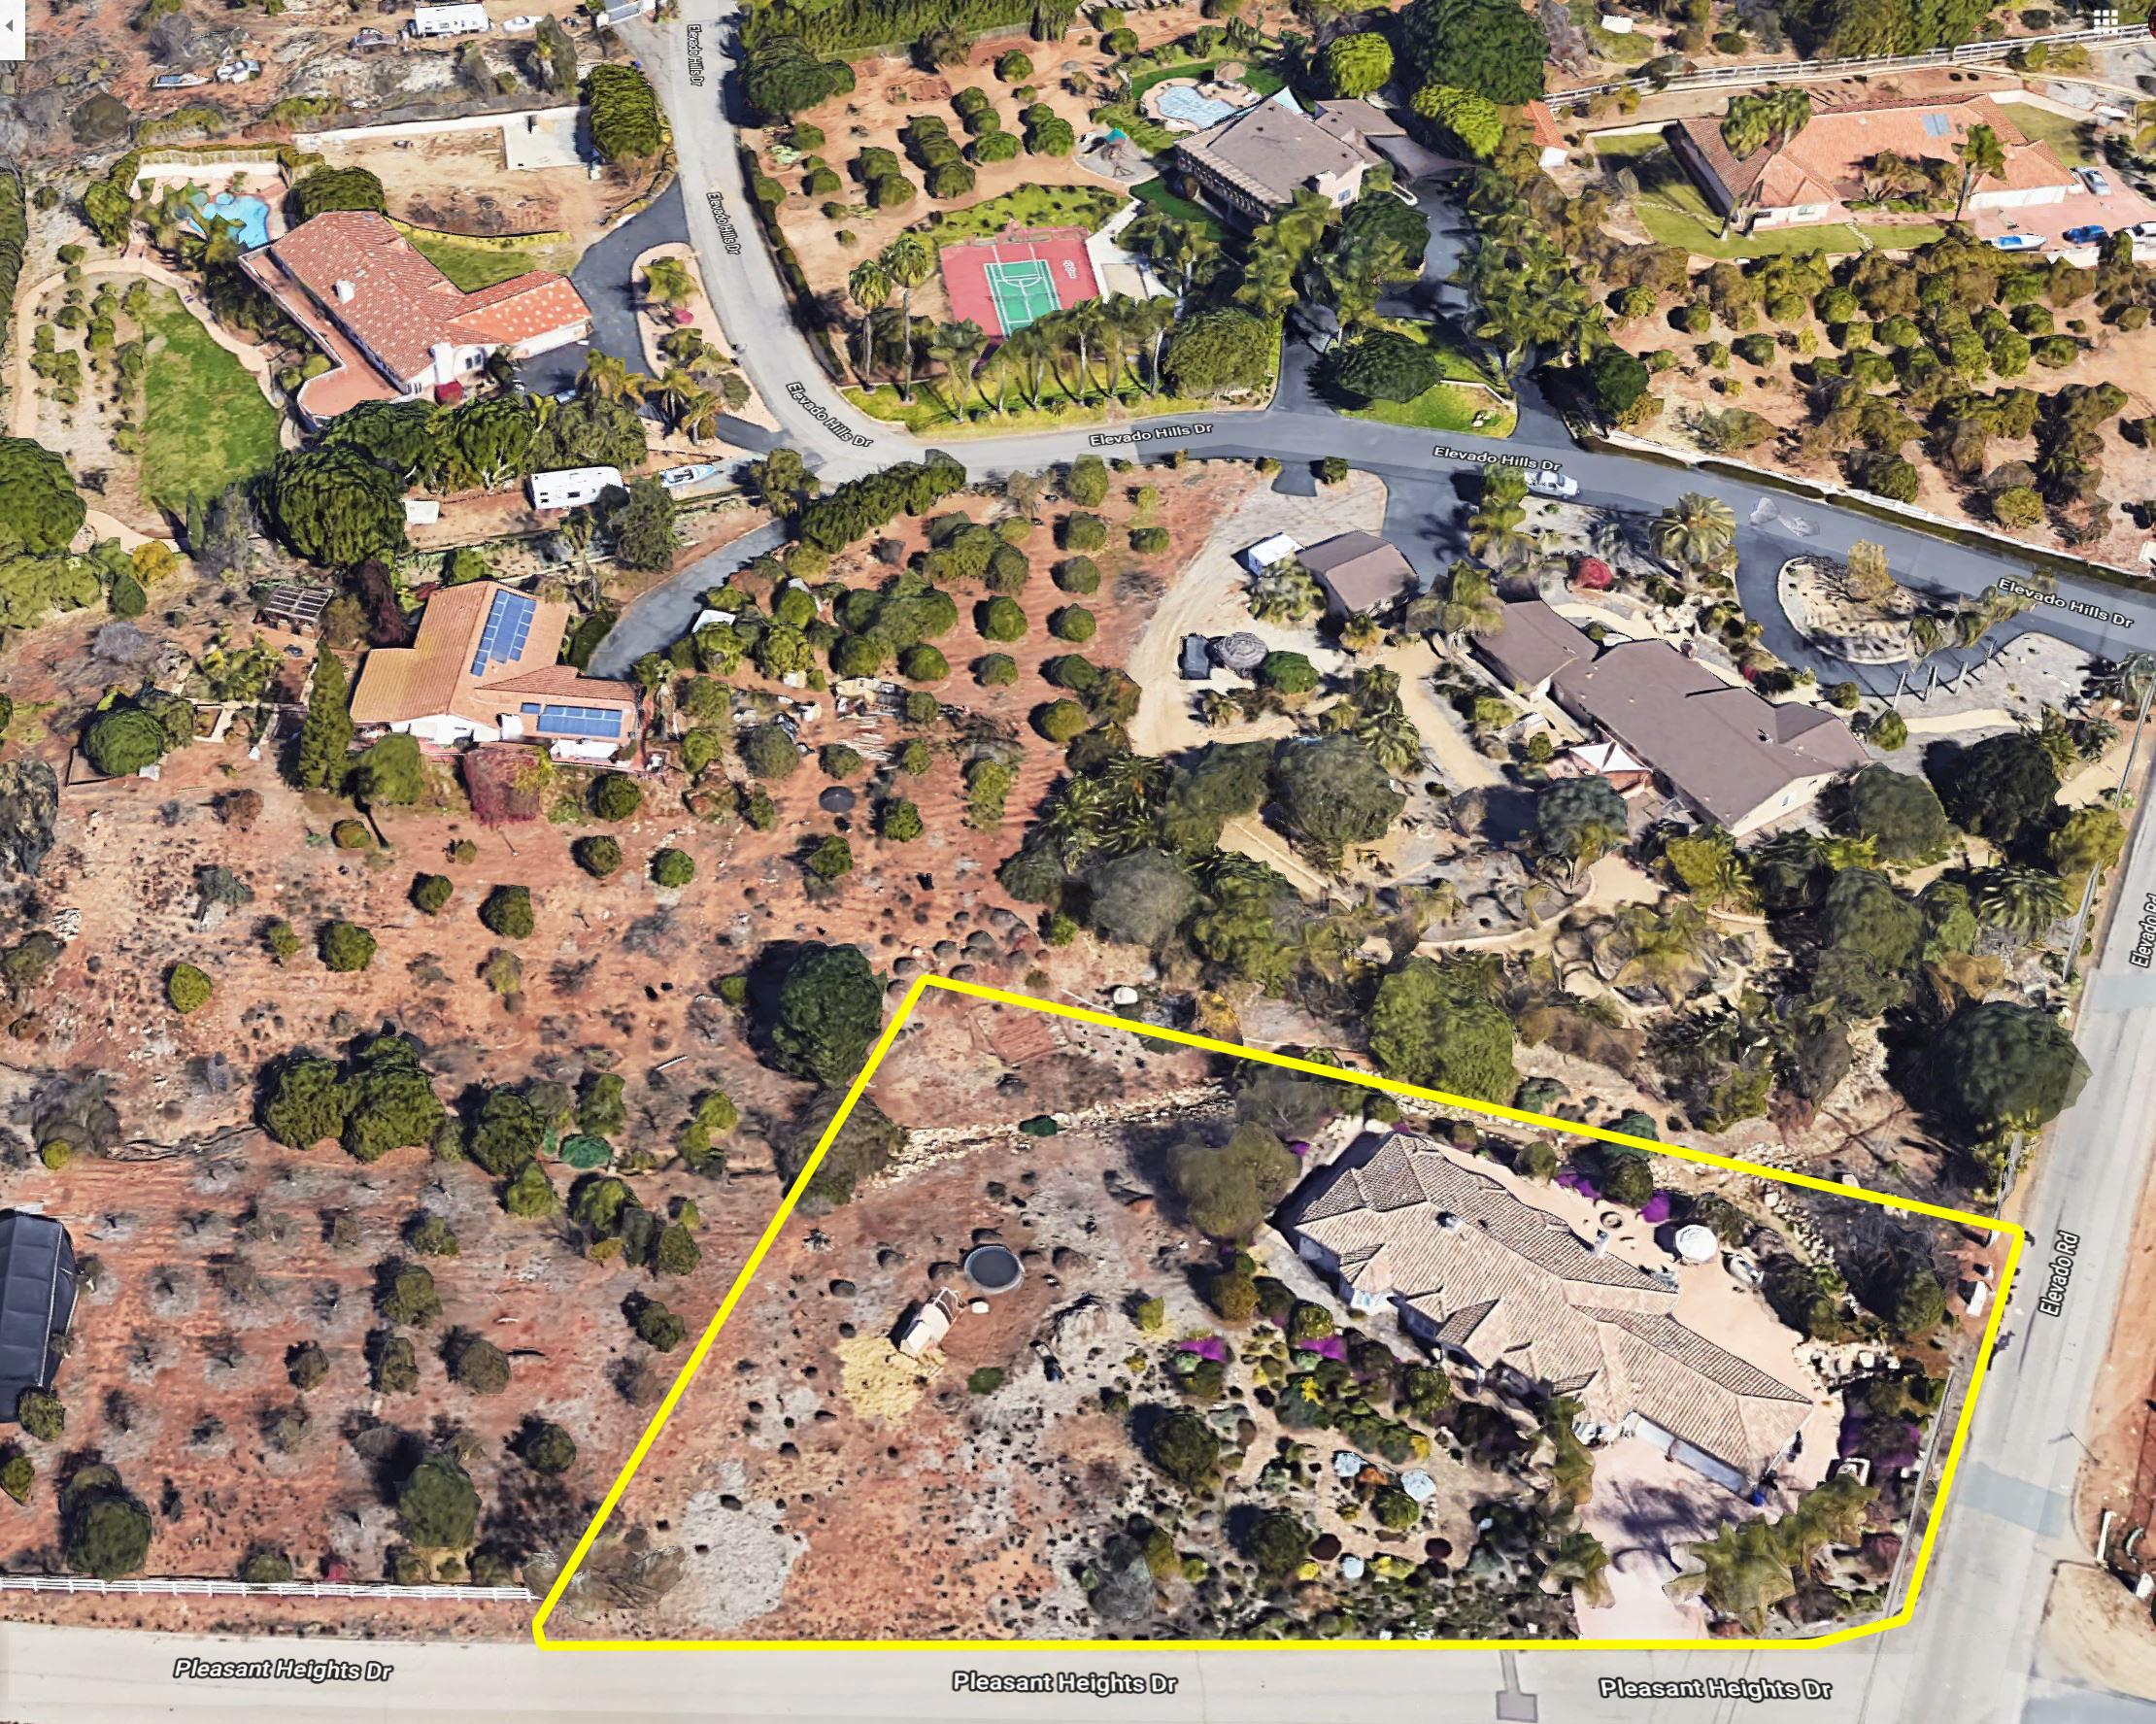 aerial-view-google-maps.jpg